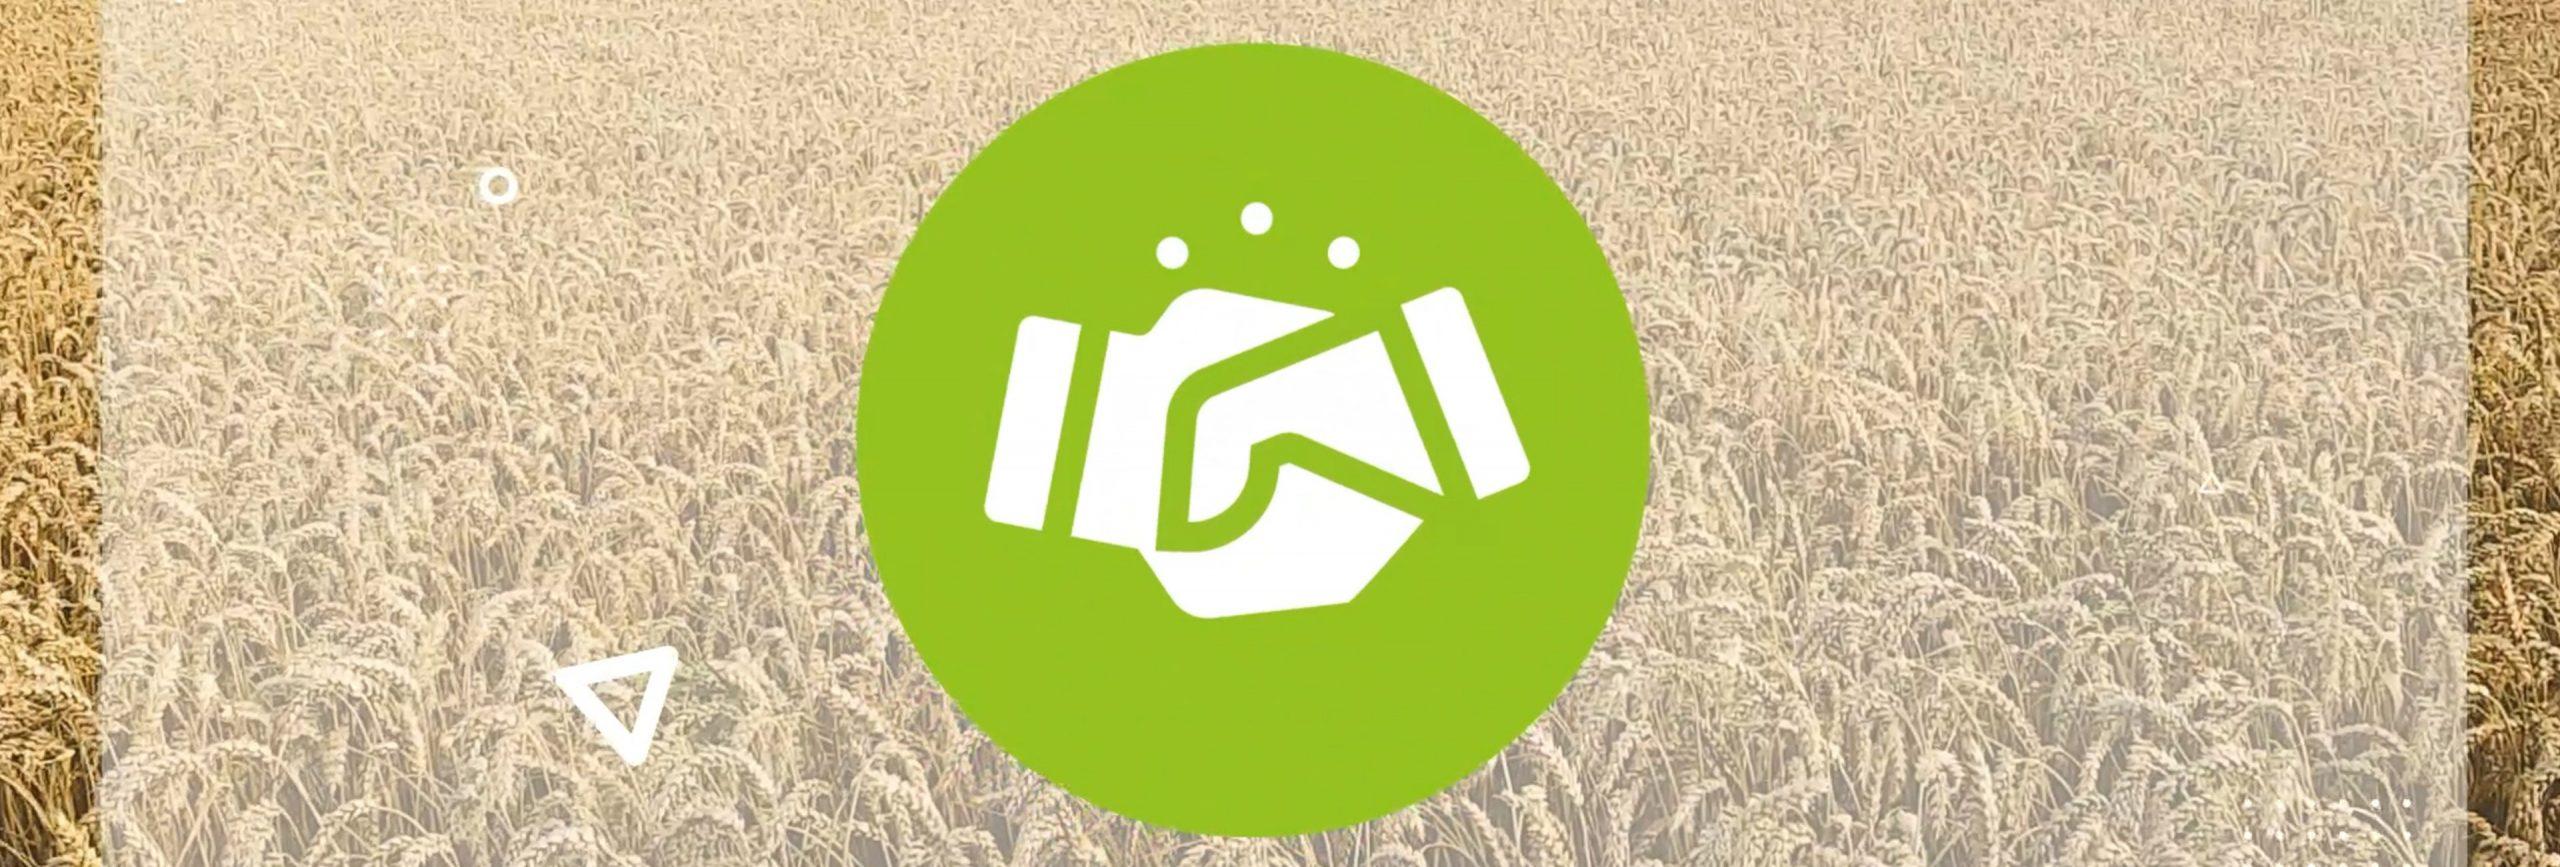 Vidéo Agrifeel Terres du Sud